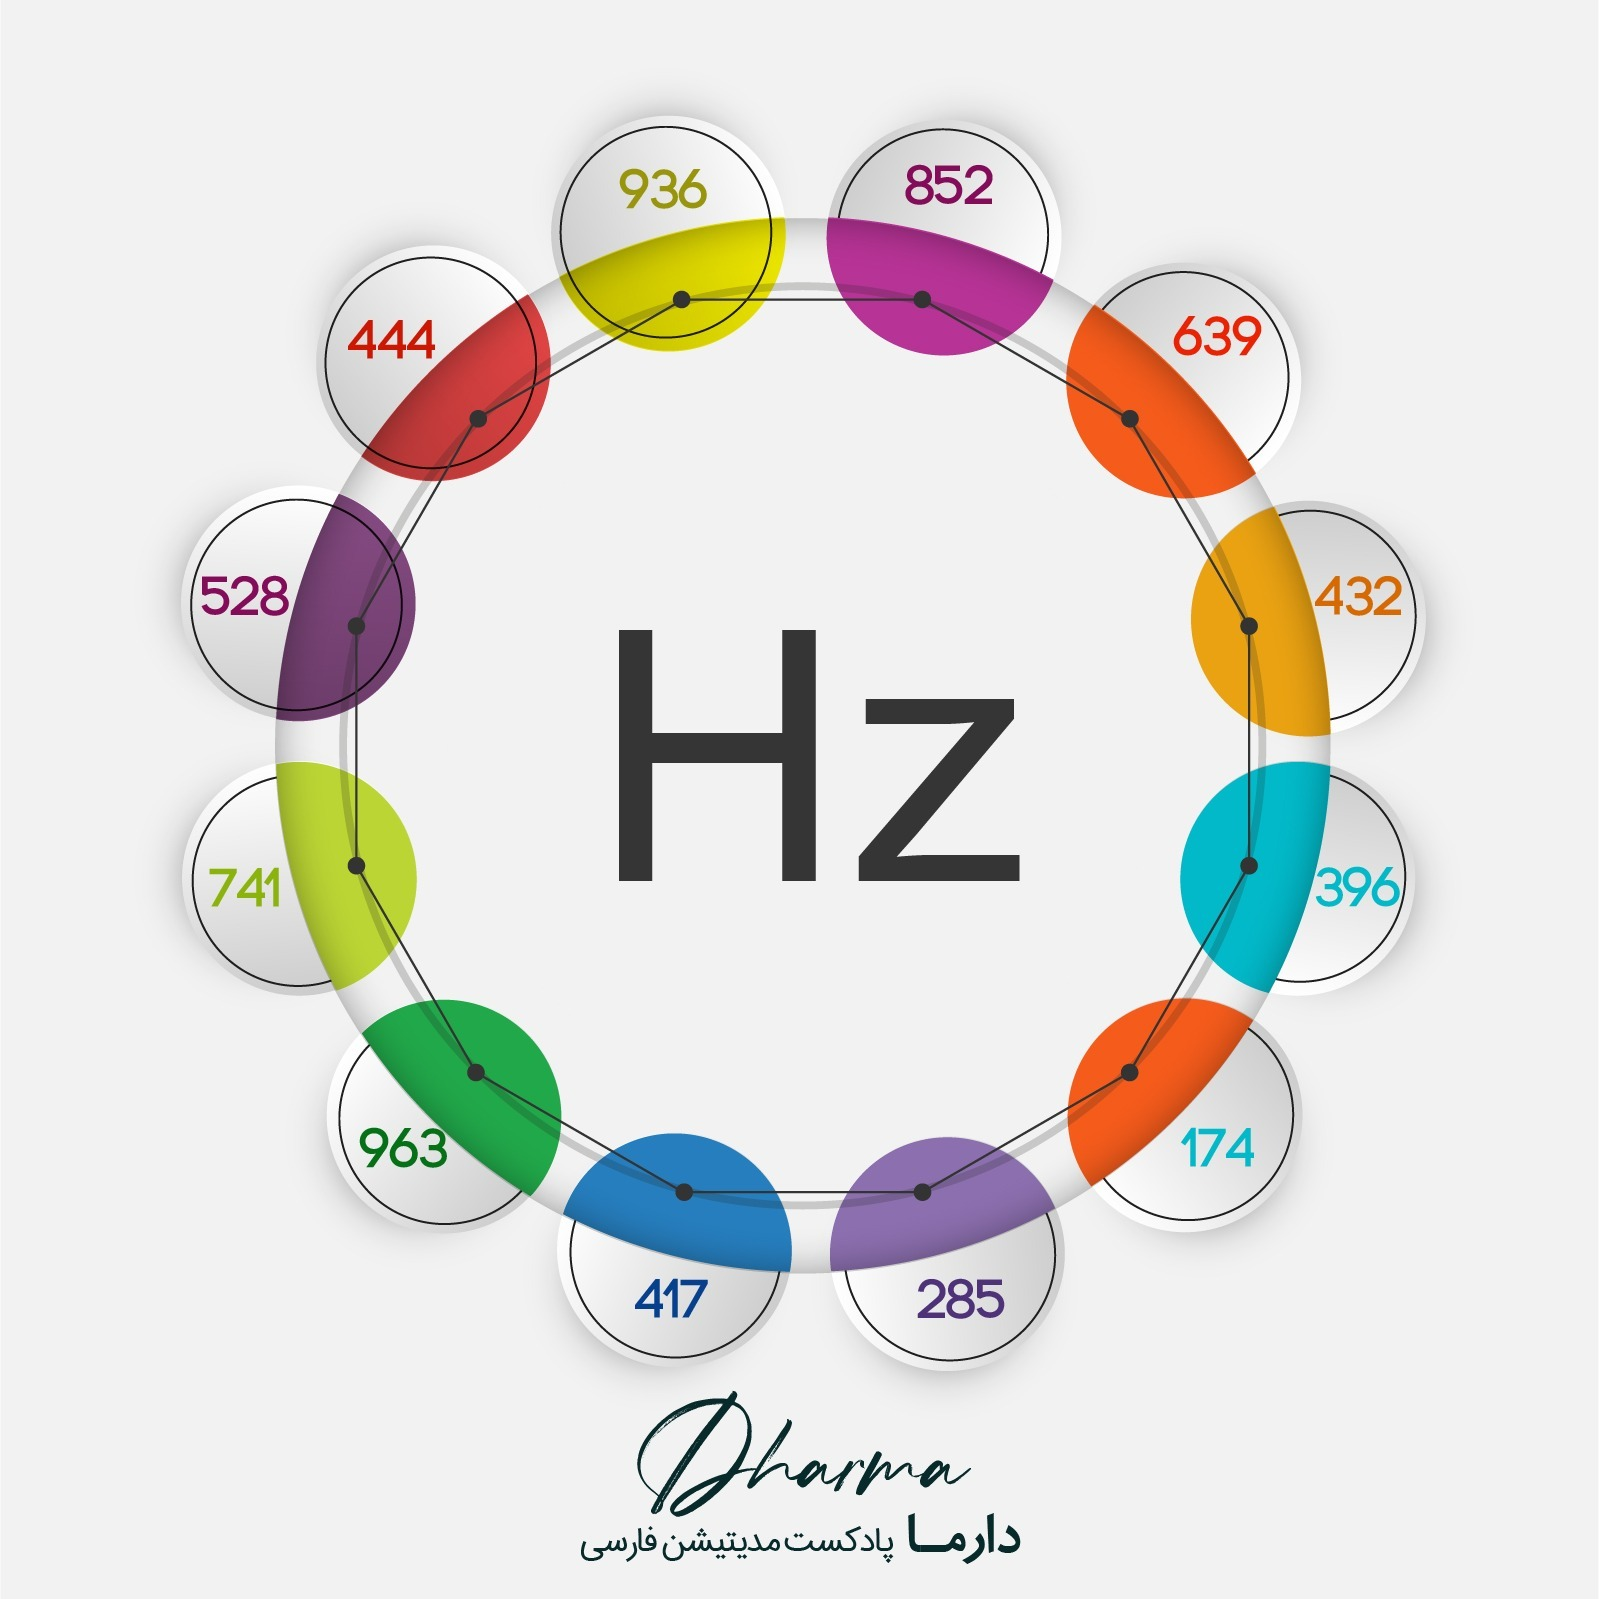 7Hz - فرکانس 7 هرتز